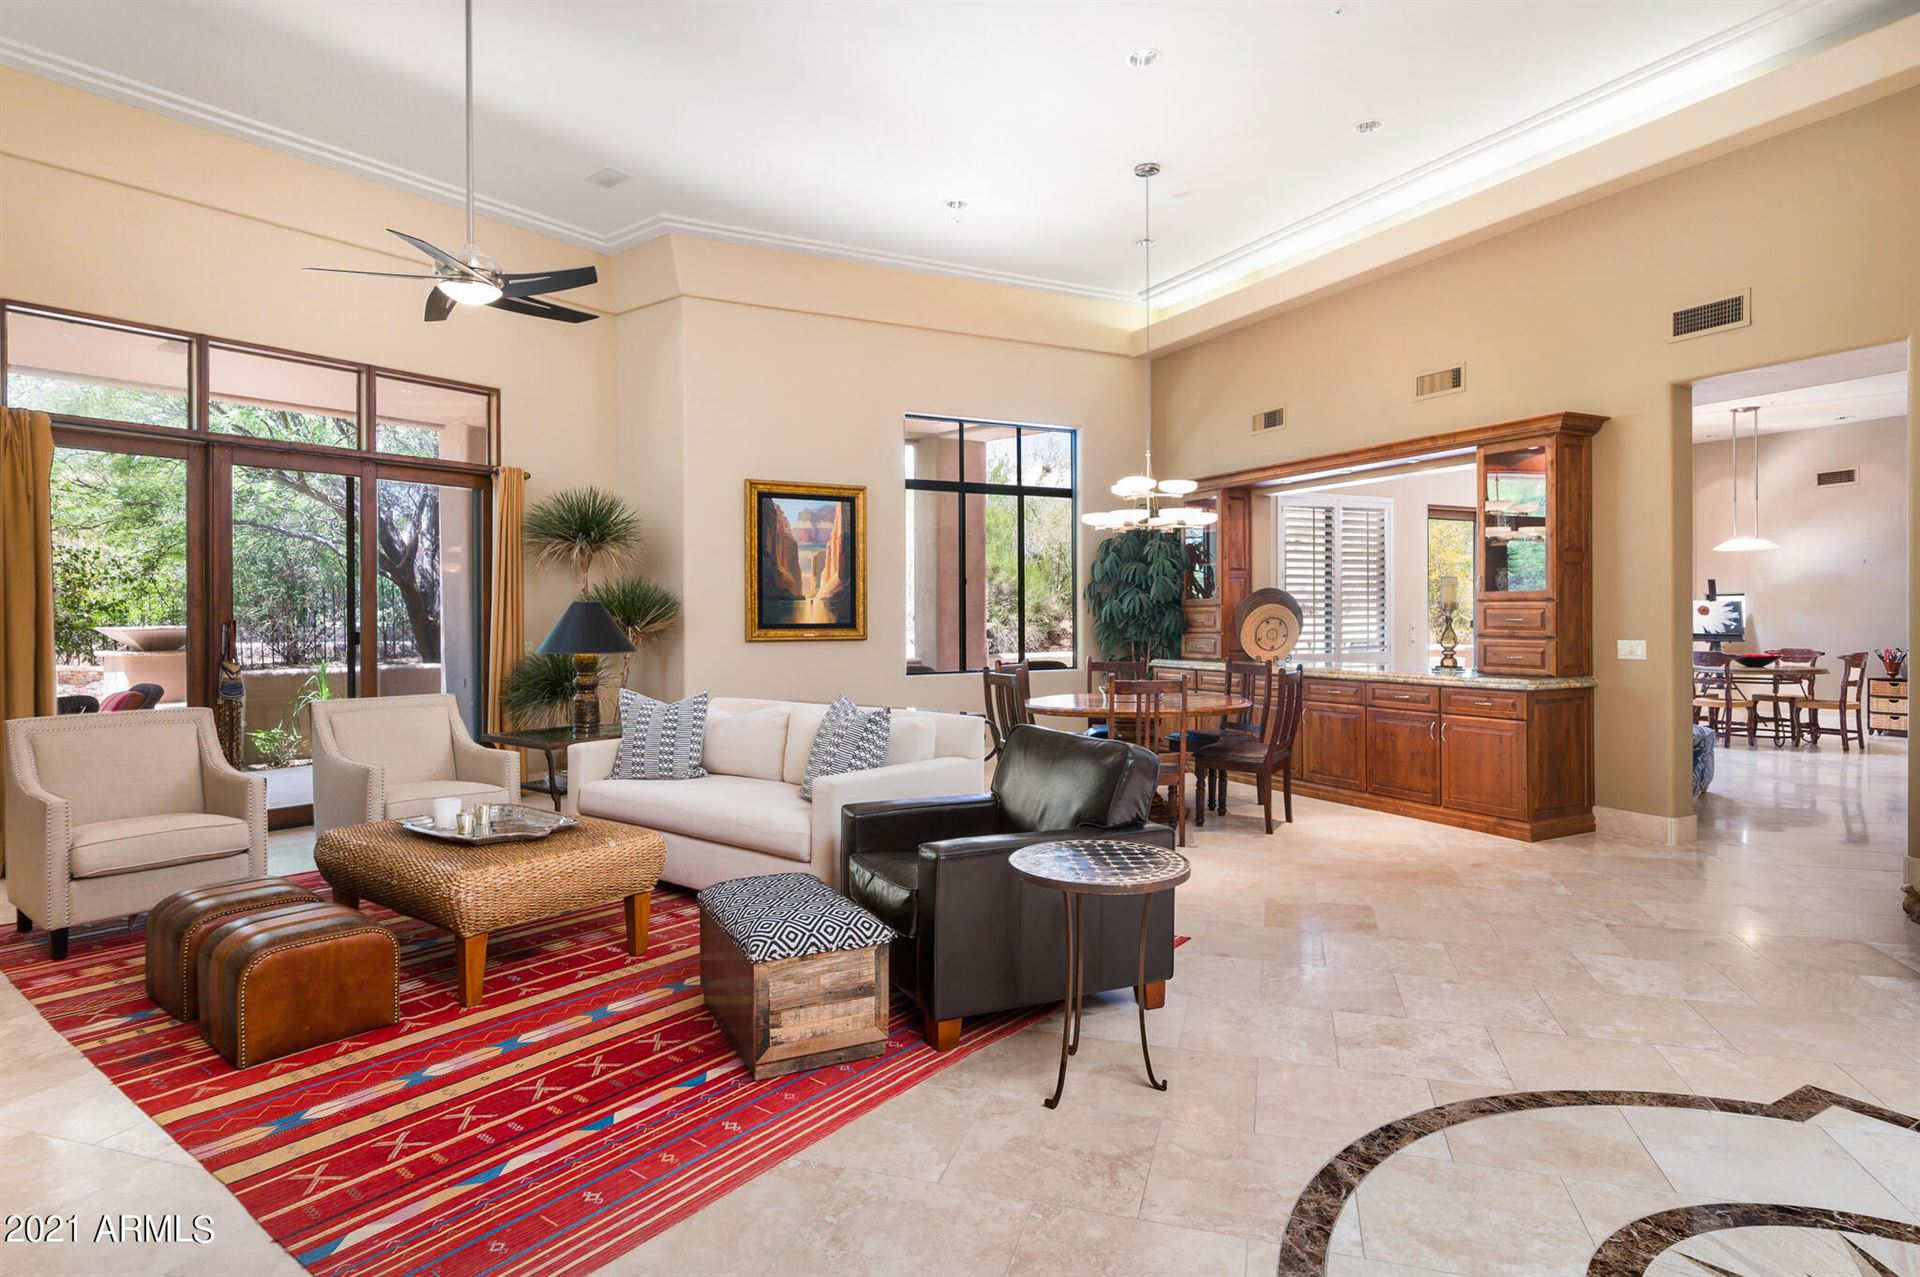 10408 E PALO BREA Drive, Scottsdale, AZ 85262 - MLS#: 6247838